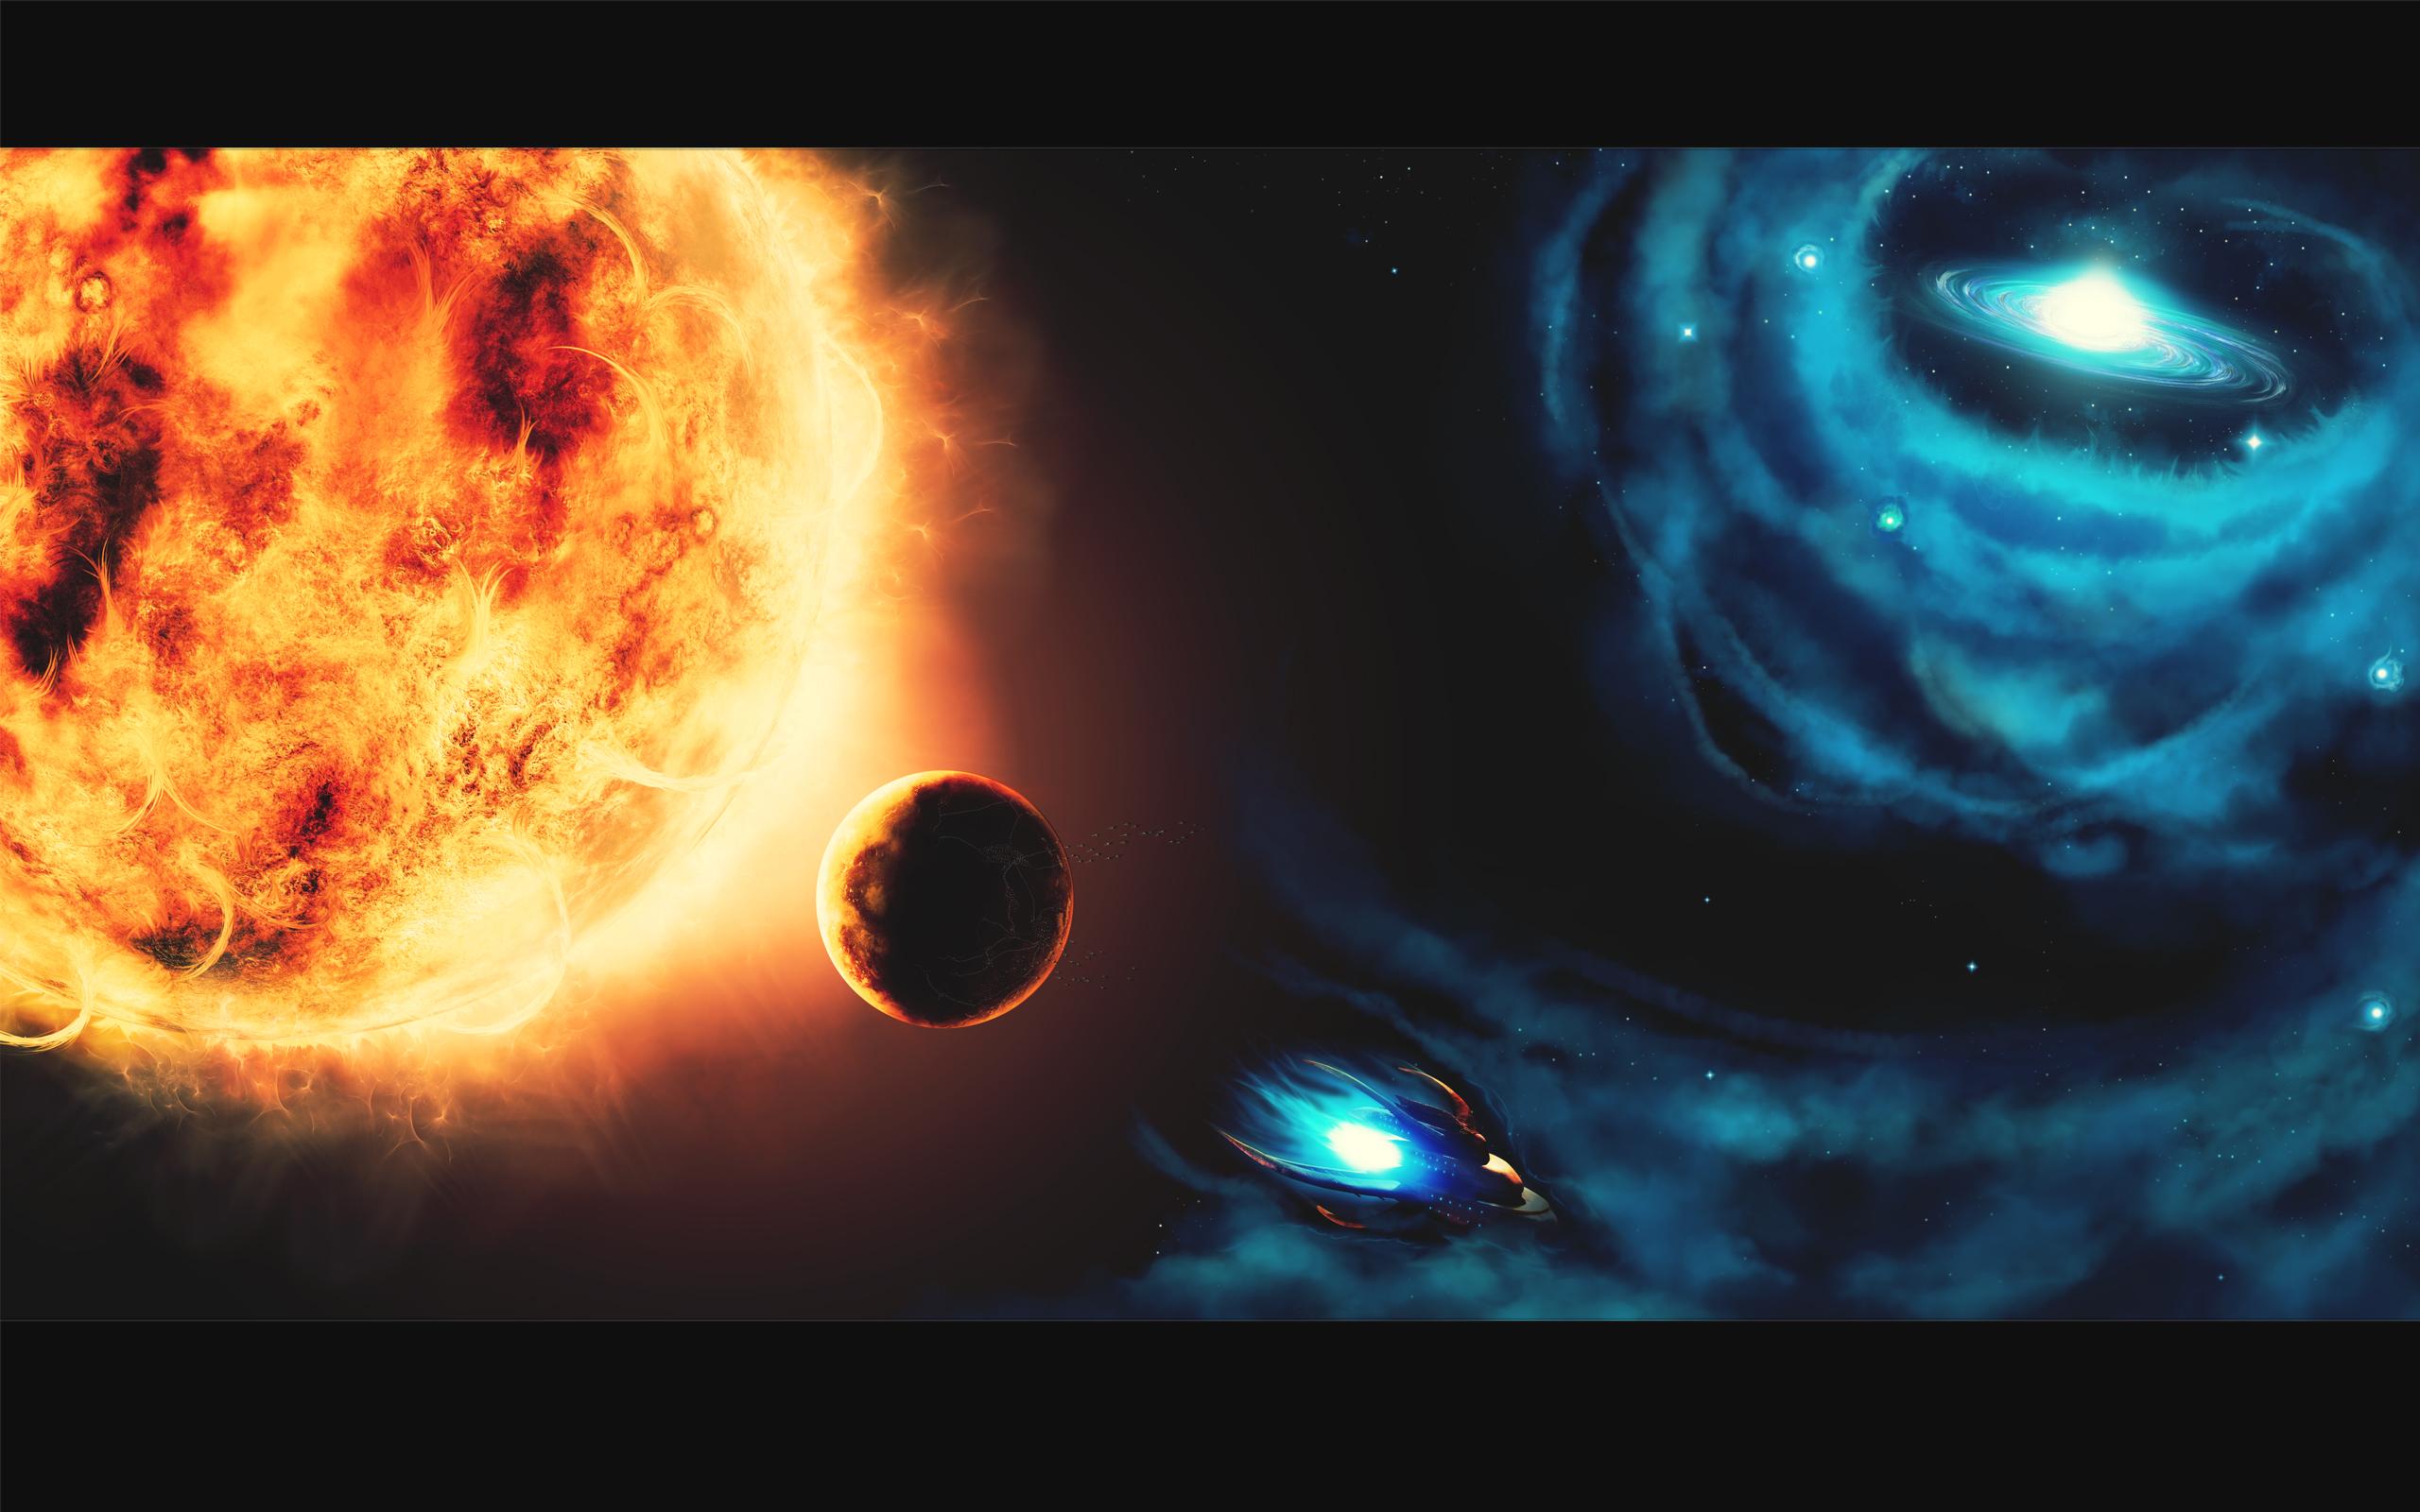 46 Cosmos Wallpaper Hd On Wallpapersafari